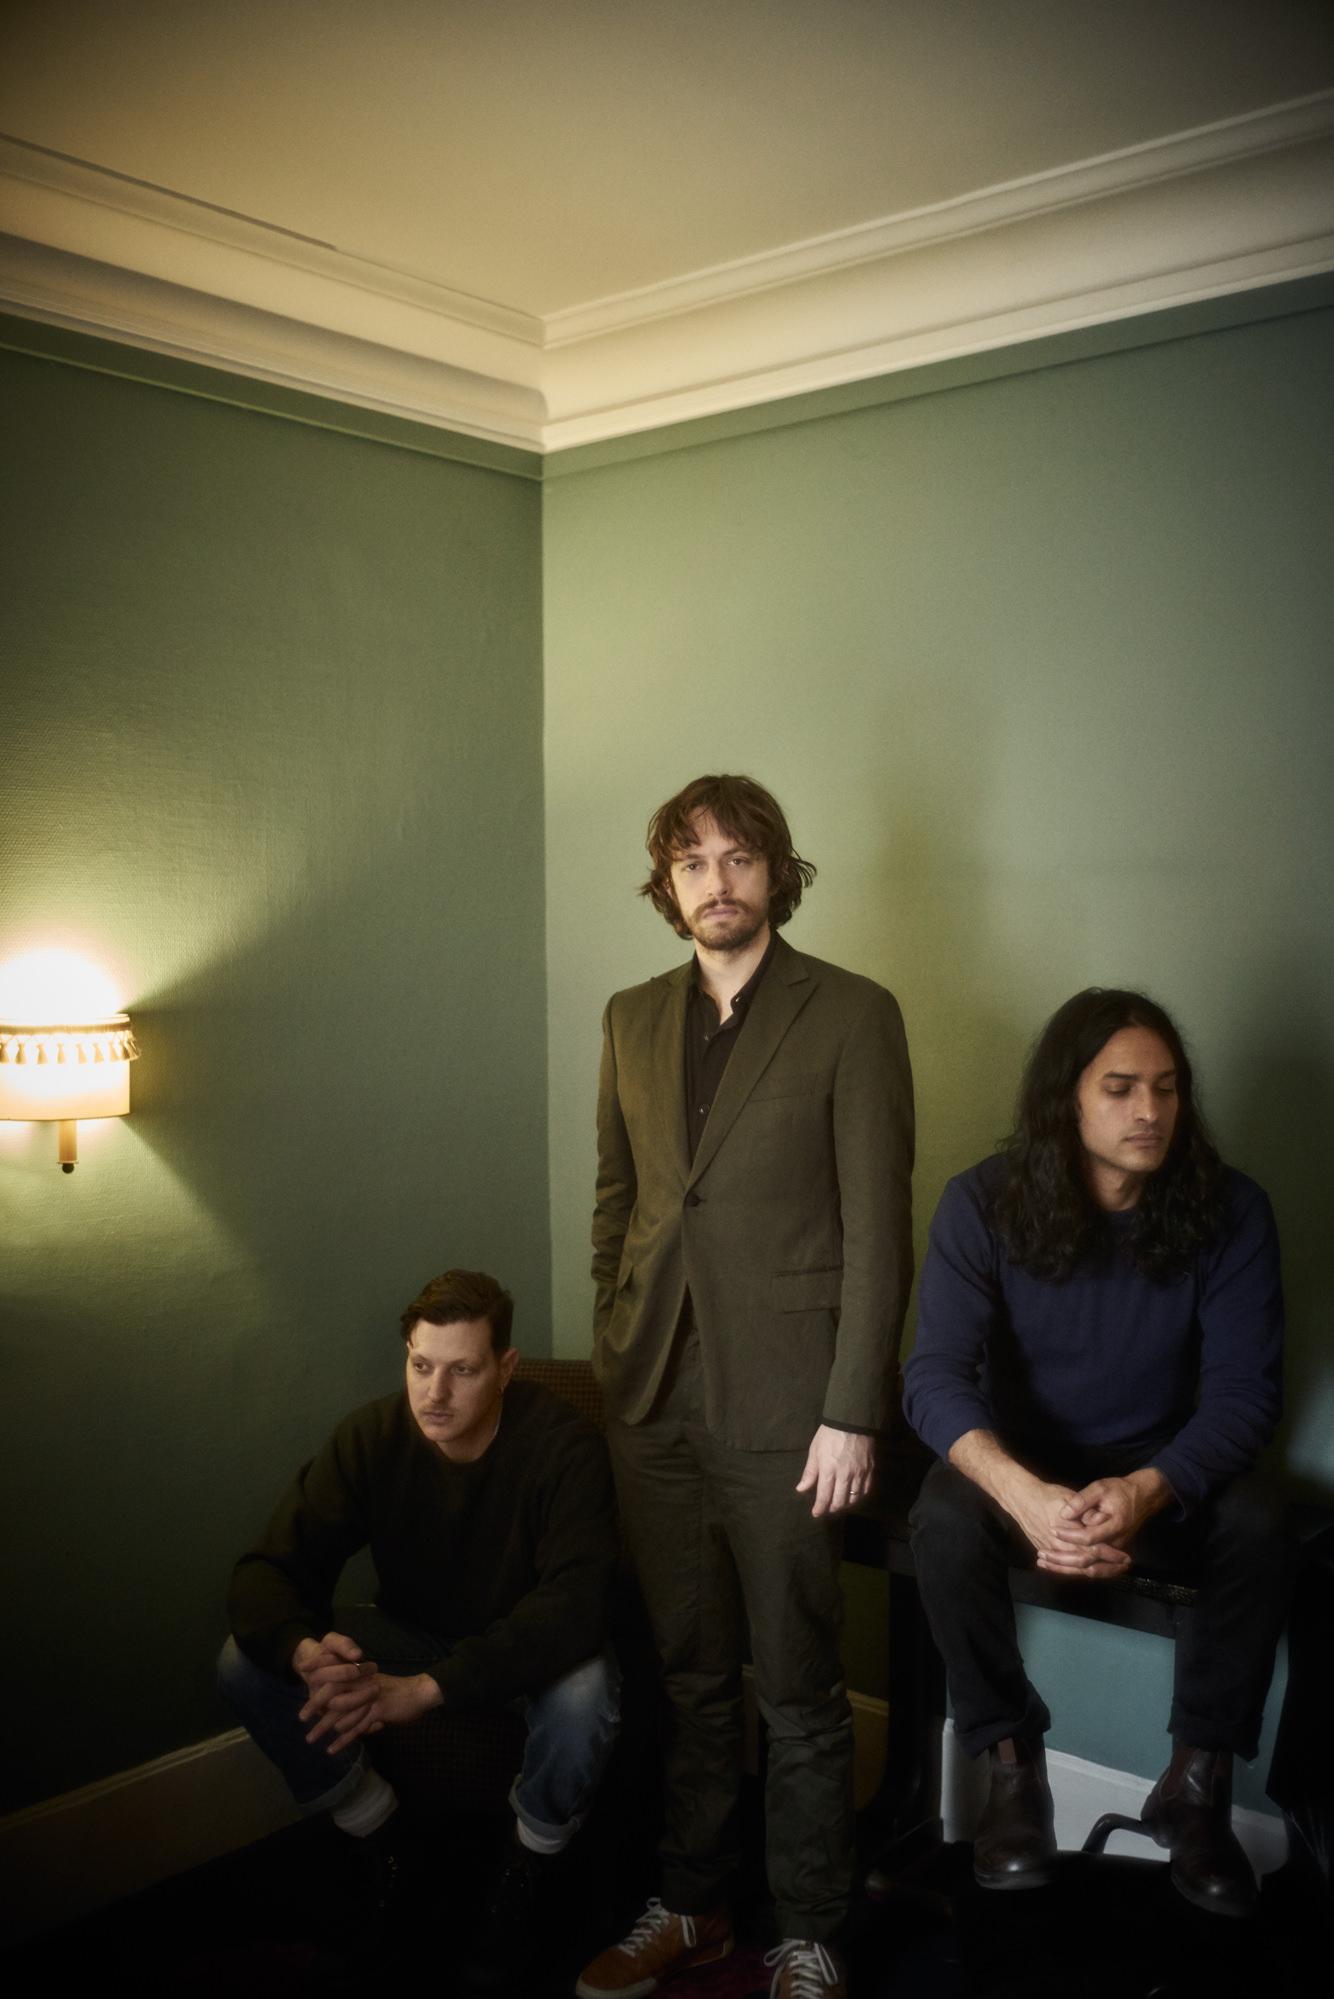 Photo :Stéphane Gallois. Les membres du groupe new-yorkais Yeasayer, Ira Wolf Tuton, Chris Keating et Anand Wilder.